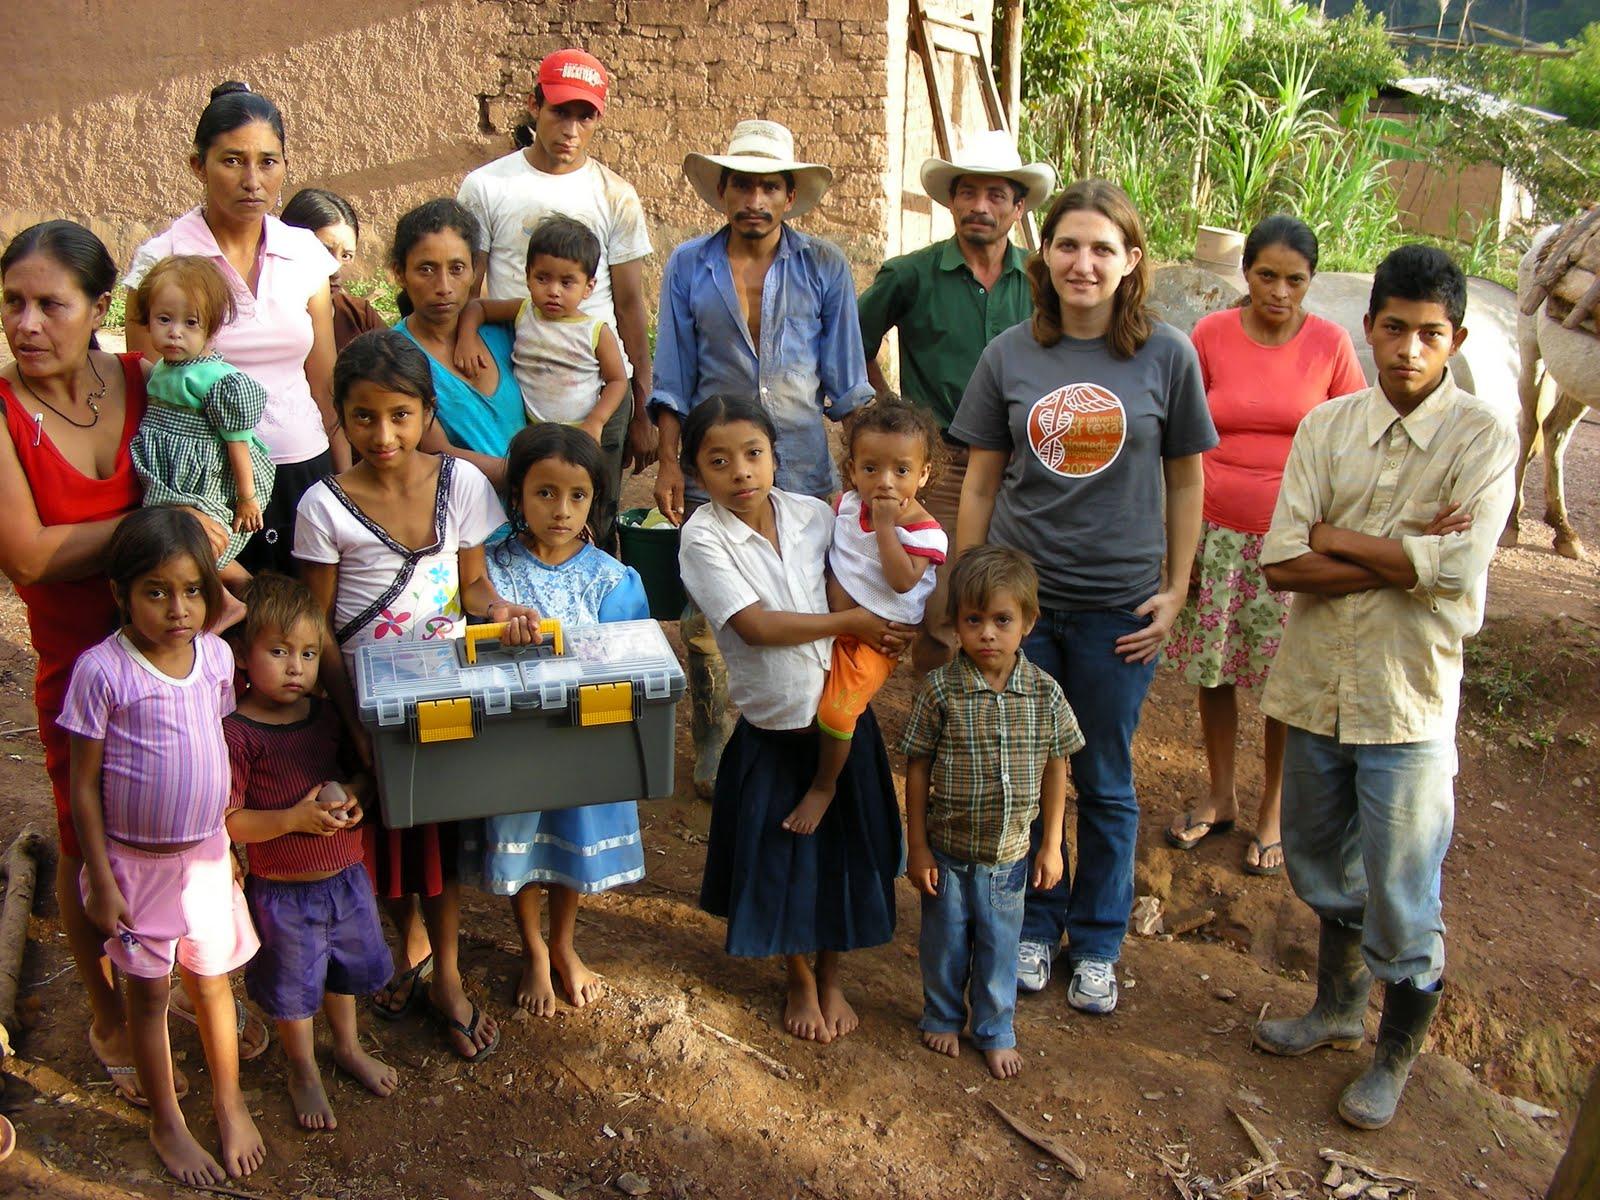 Honduran Villages Caught in Drug War's Cross-Fire - The New York Times